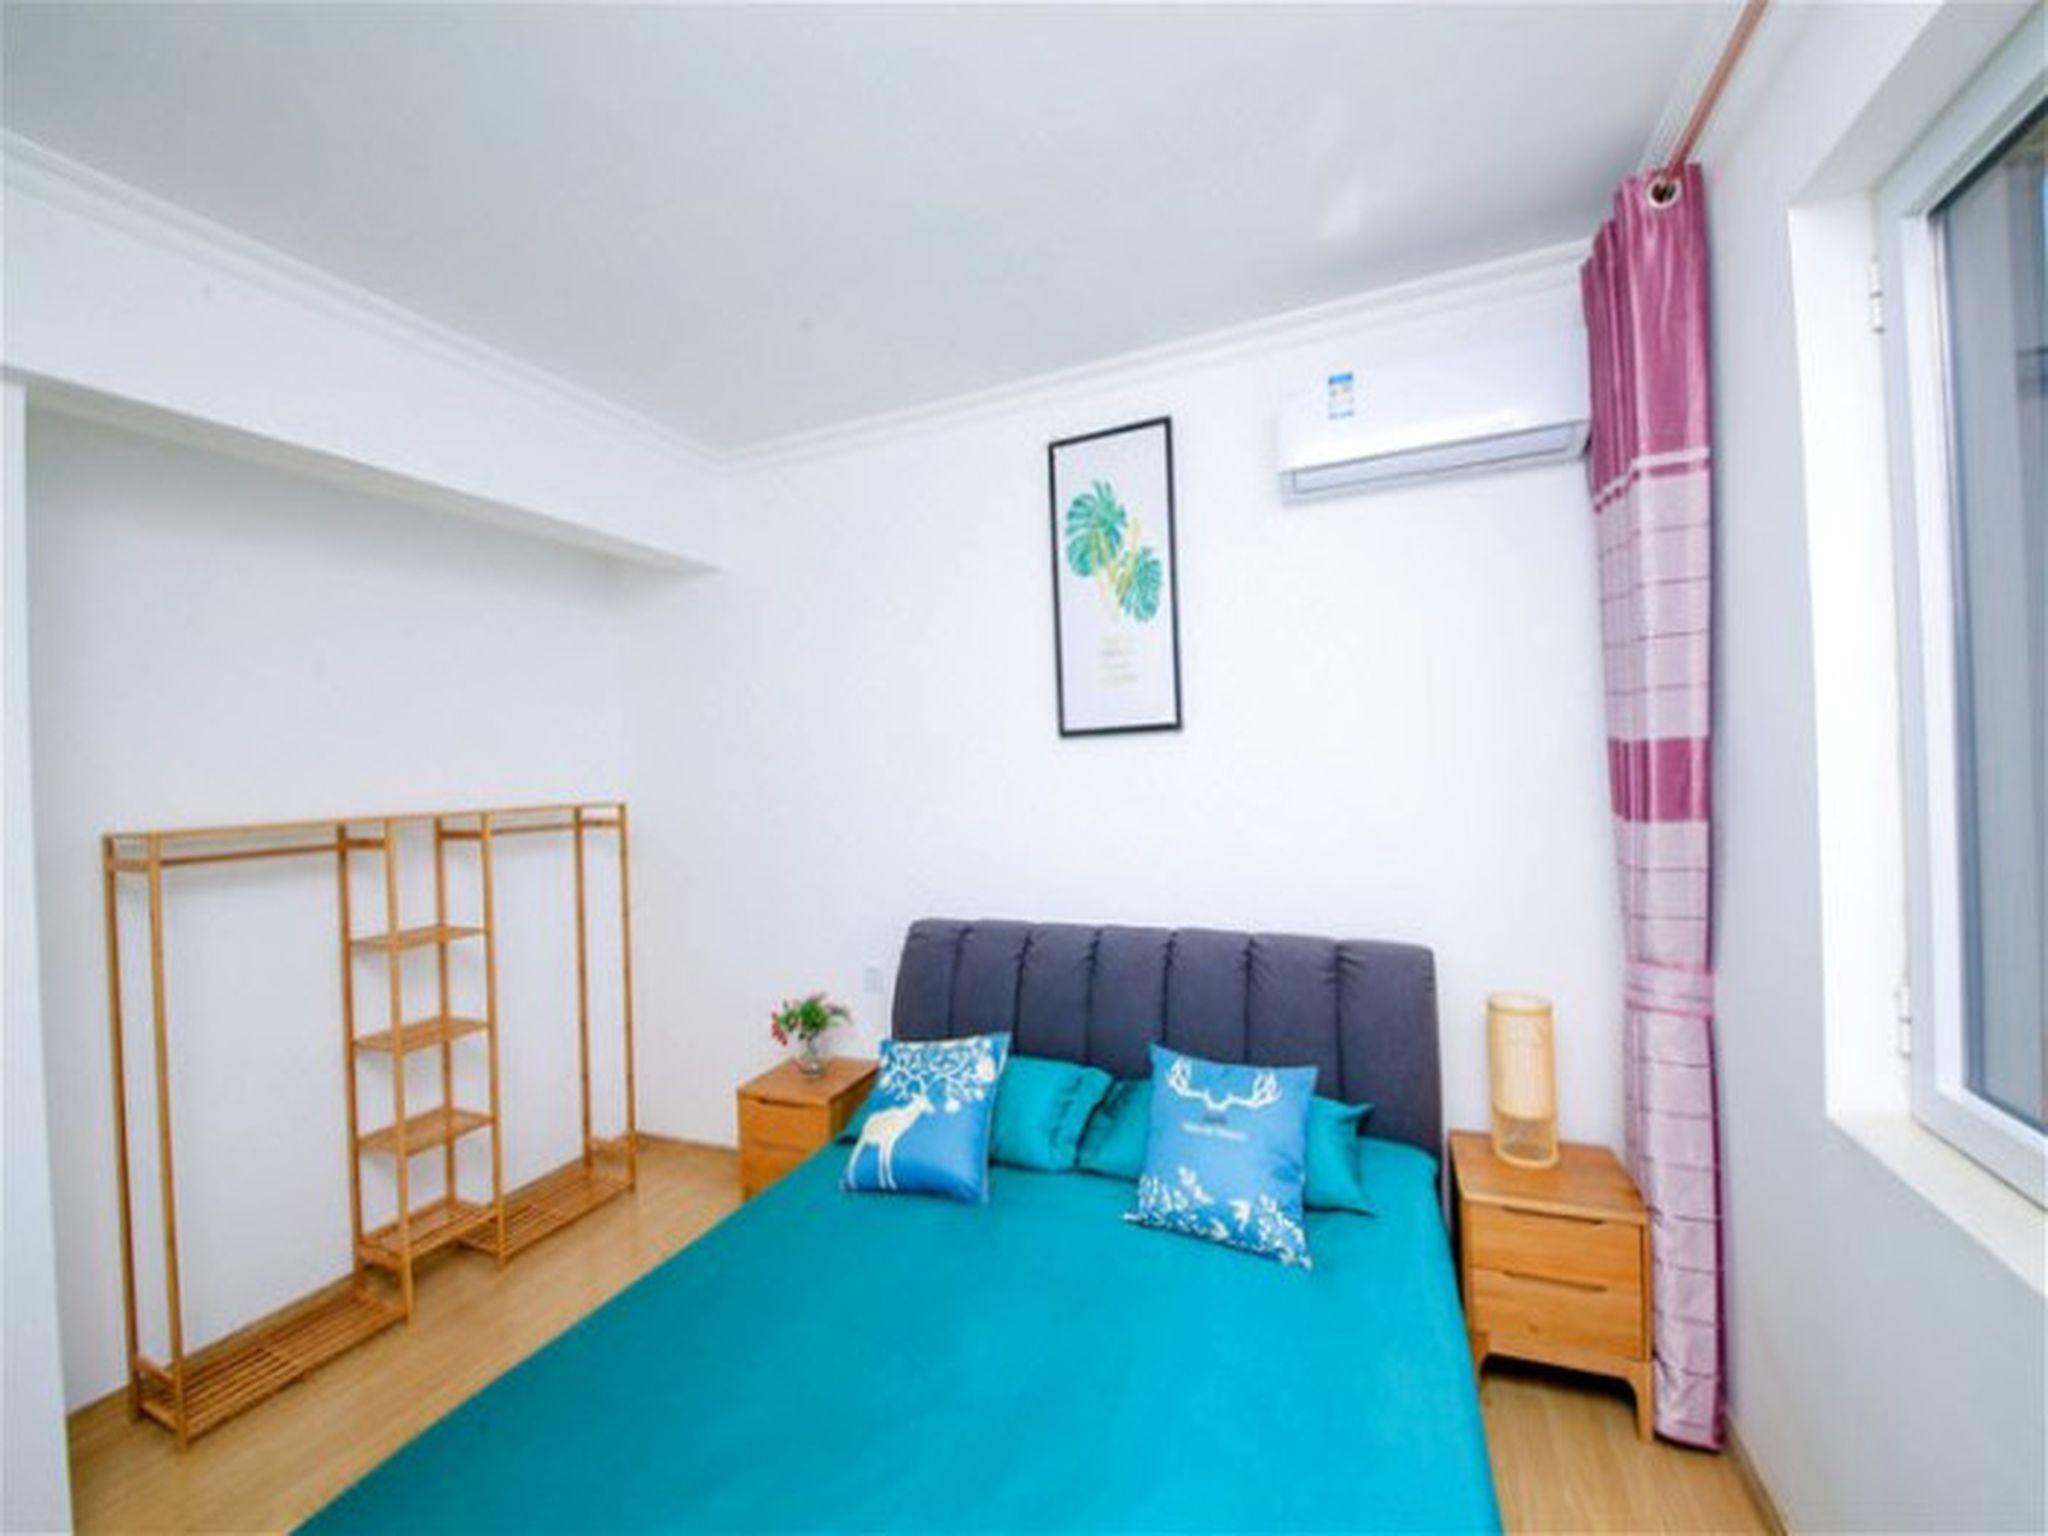 MD Holiday Service Apartment(Yantai Penglai Biguiyuan), Yantai